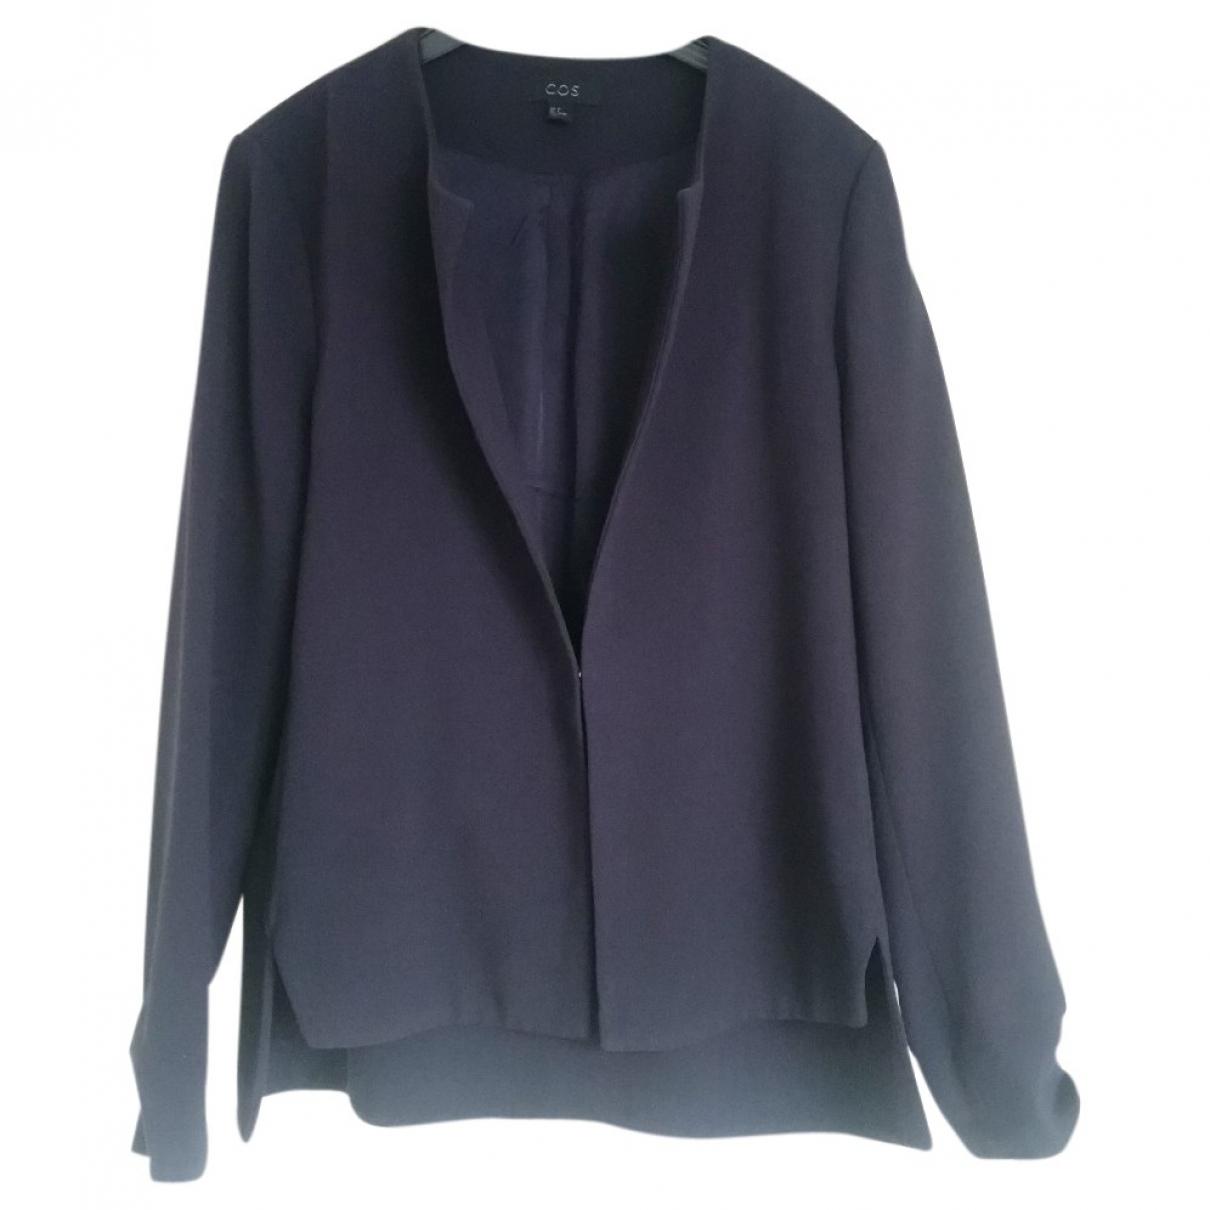 Cos \N Navy jacket for Women XS International